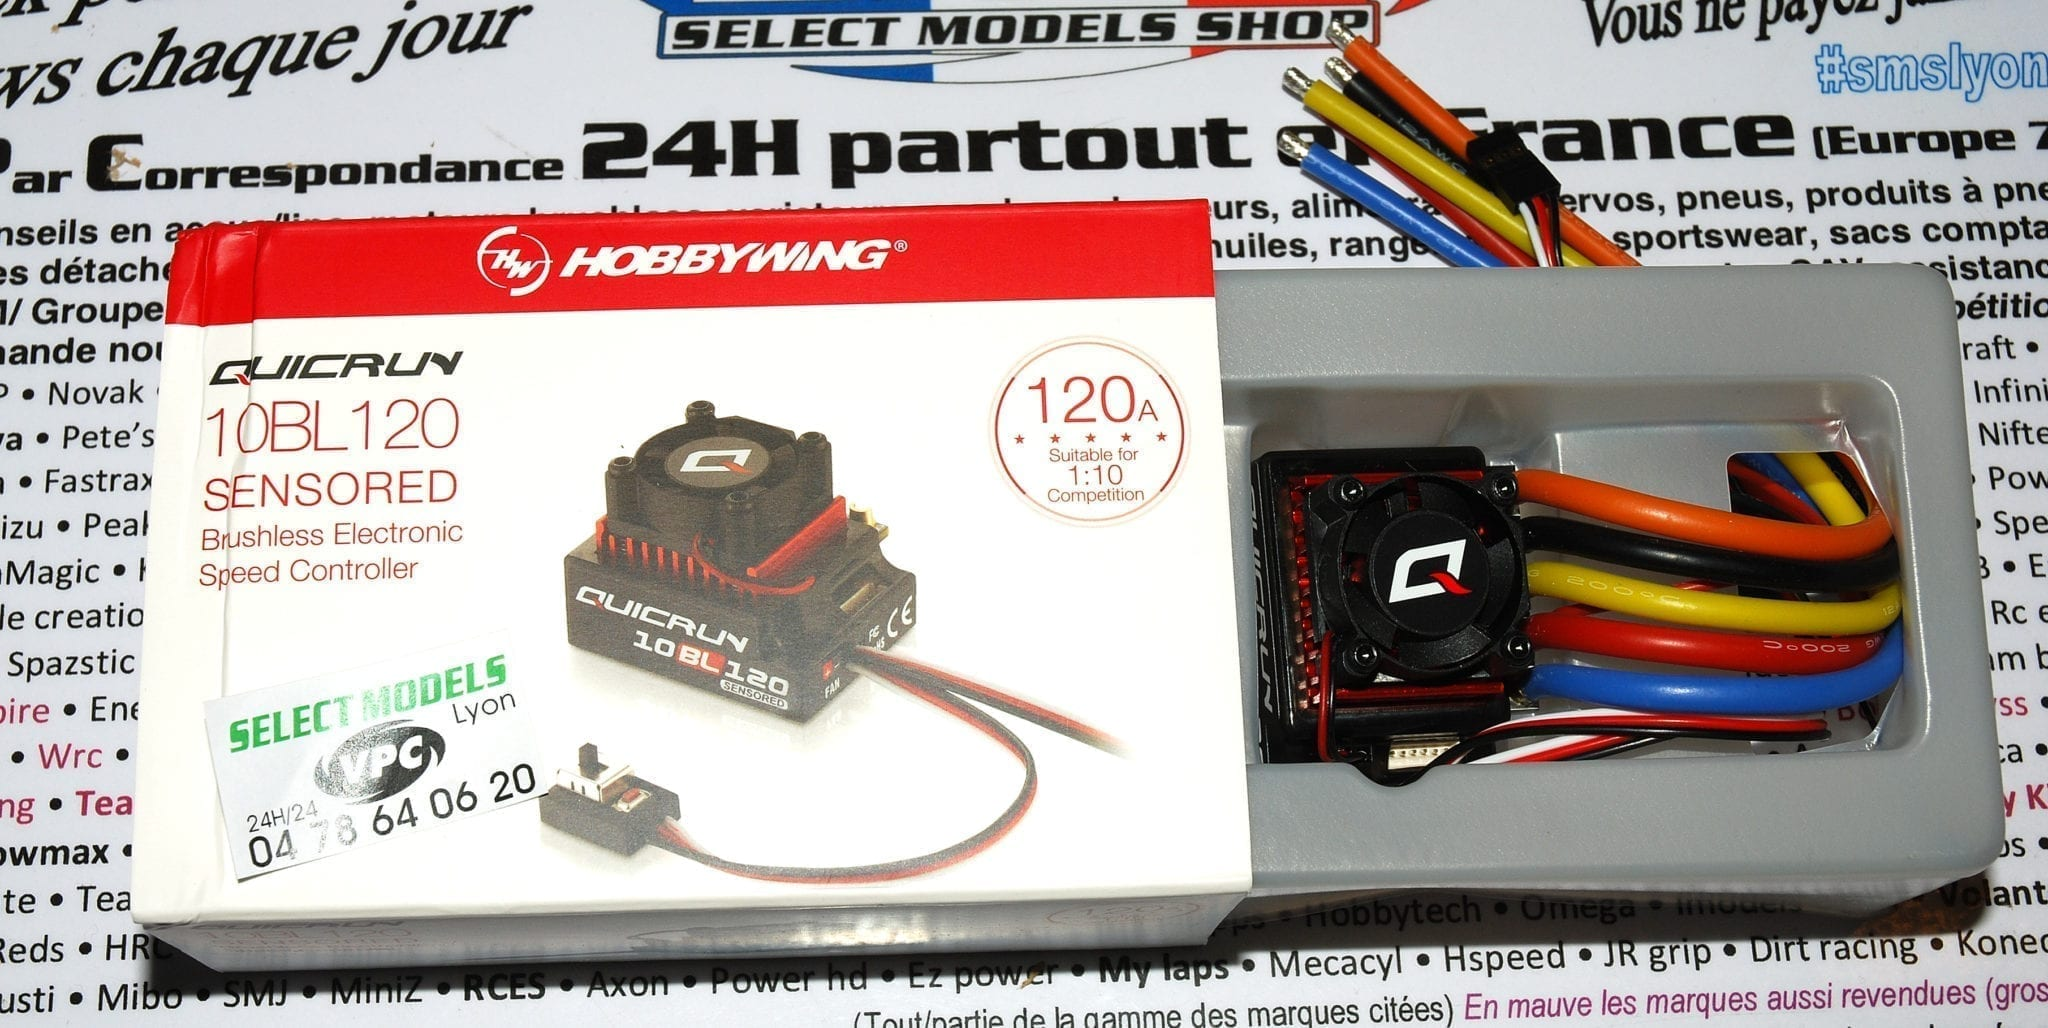 Quicrun 1/10 120A sensored Hobbywing